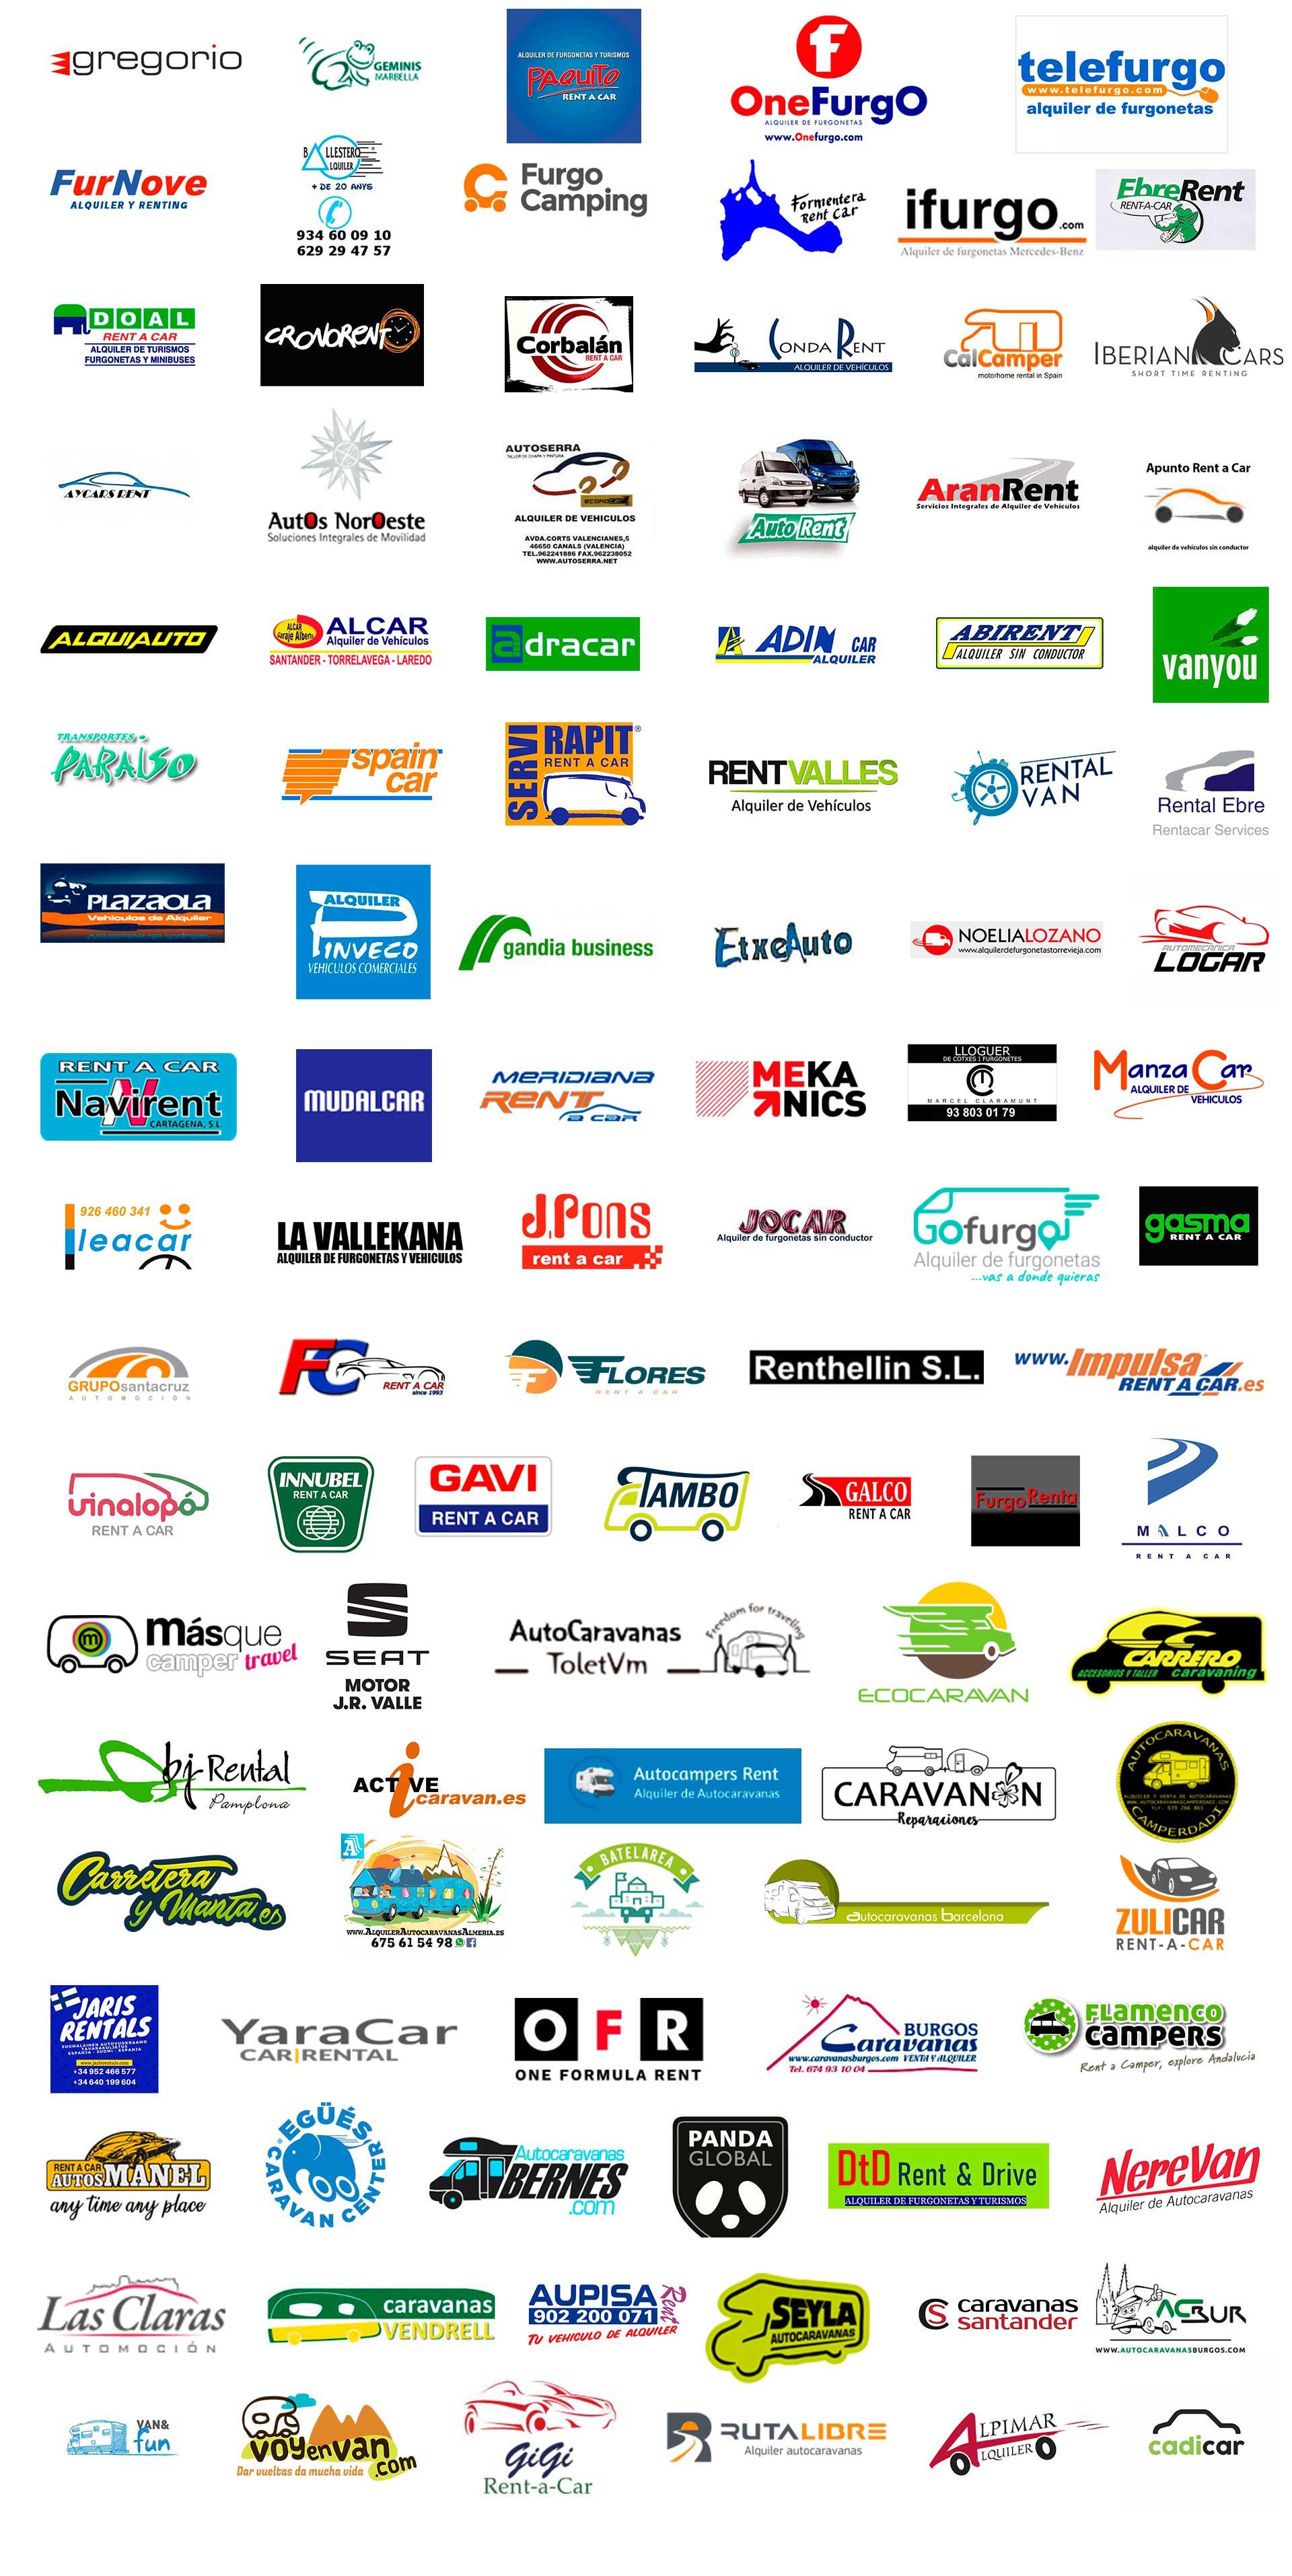 Rent a cars distribuidores de Garantía Franquicia Plus